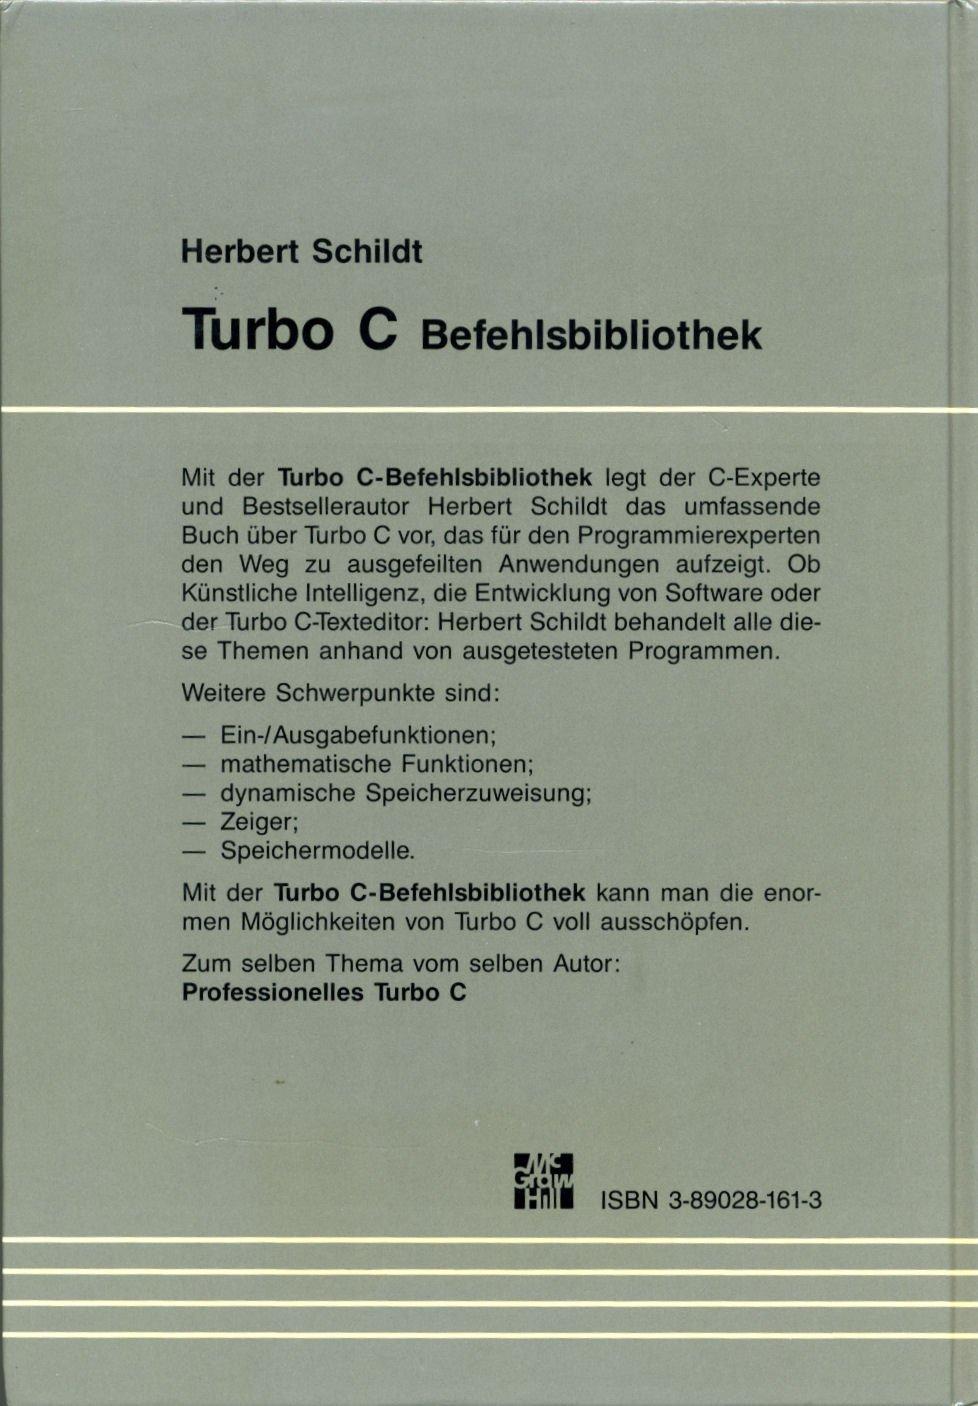 Turbo C-Befehlsbibliothek: Amazon.es: Herbert Schildt: Libros en idiomas extranjeros